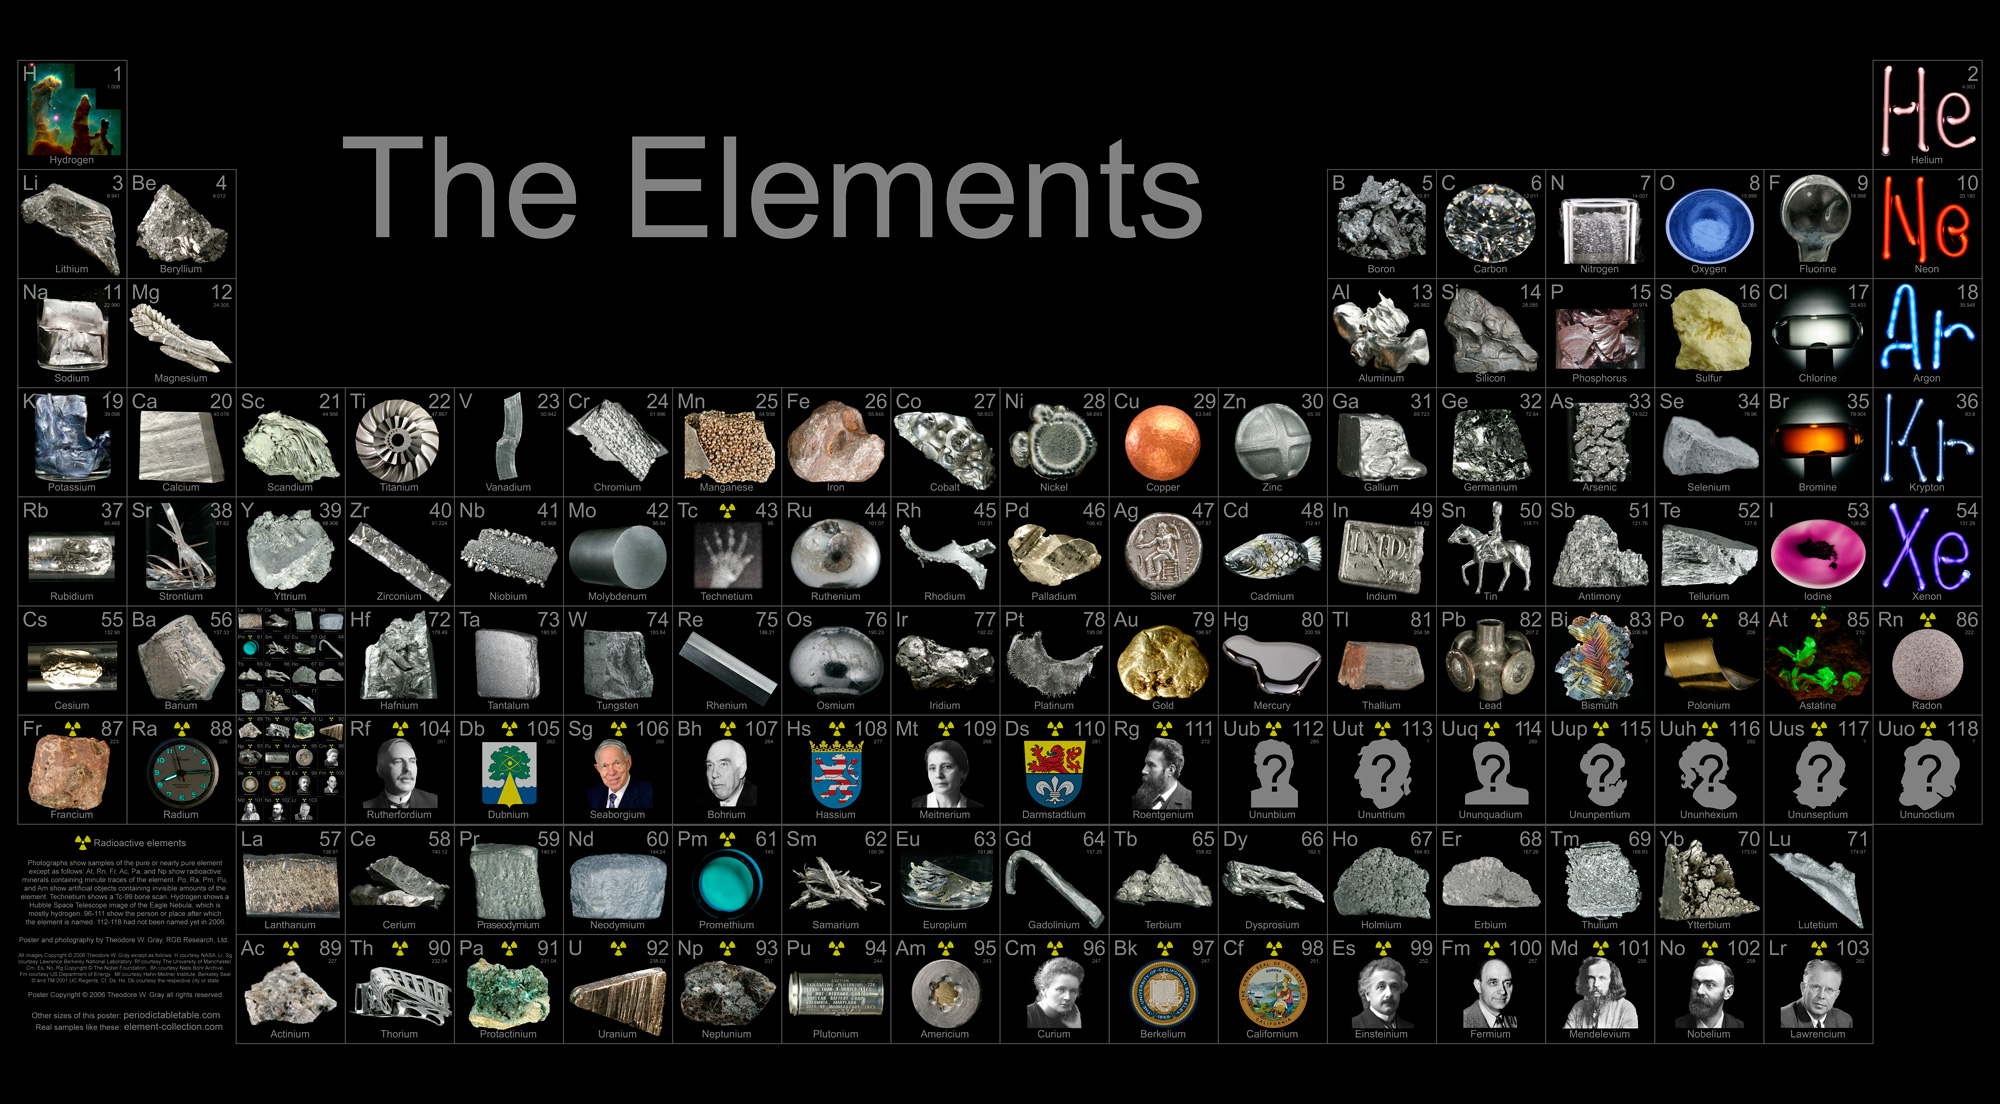 Elements HD wallpapers, Desktop wallpaper - most viewed